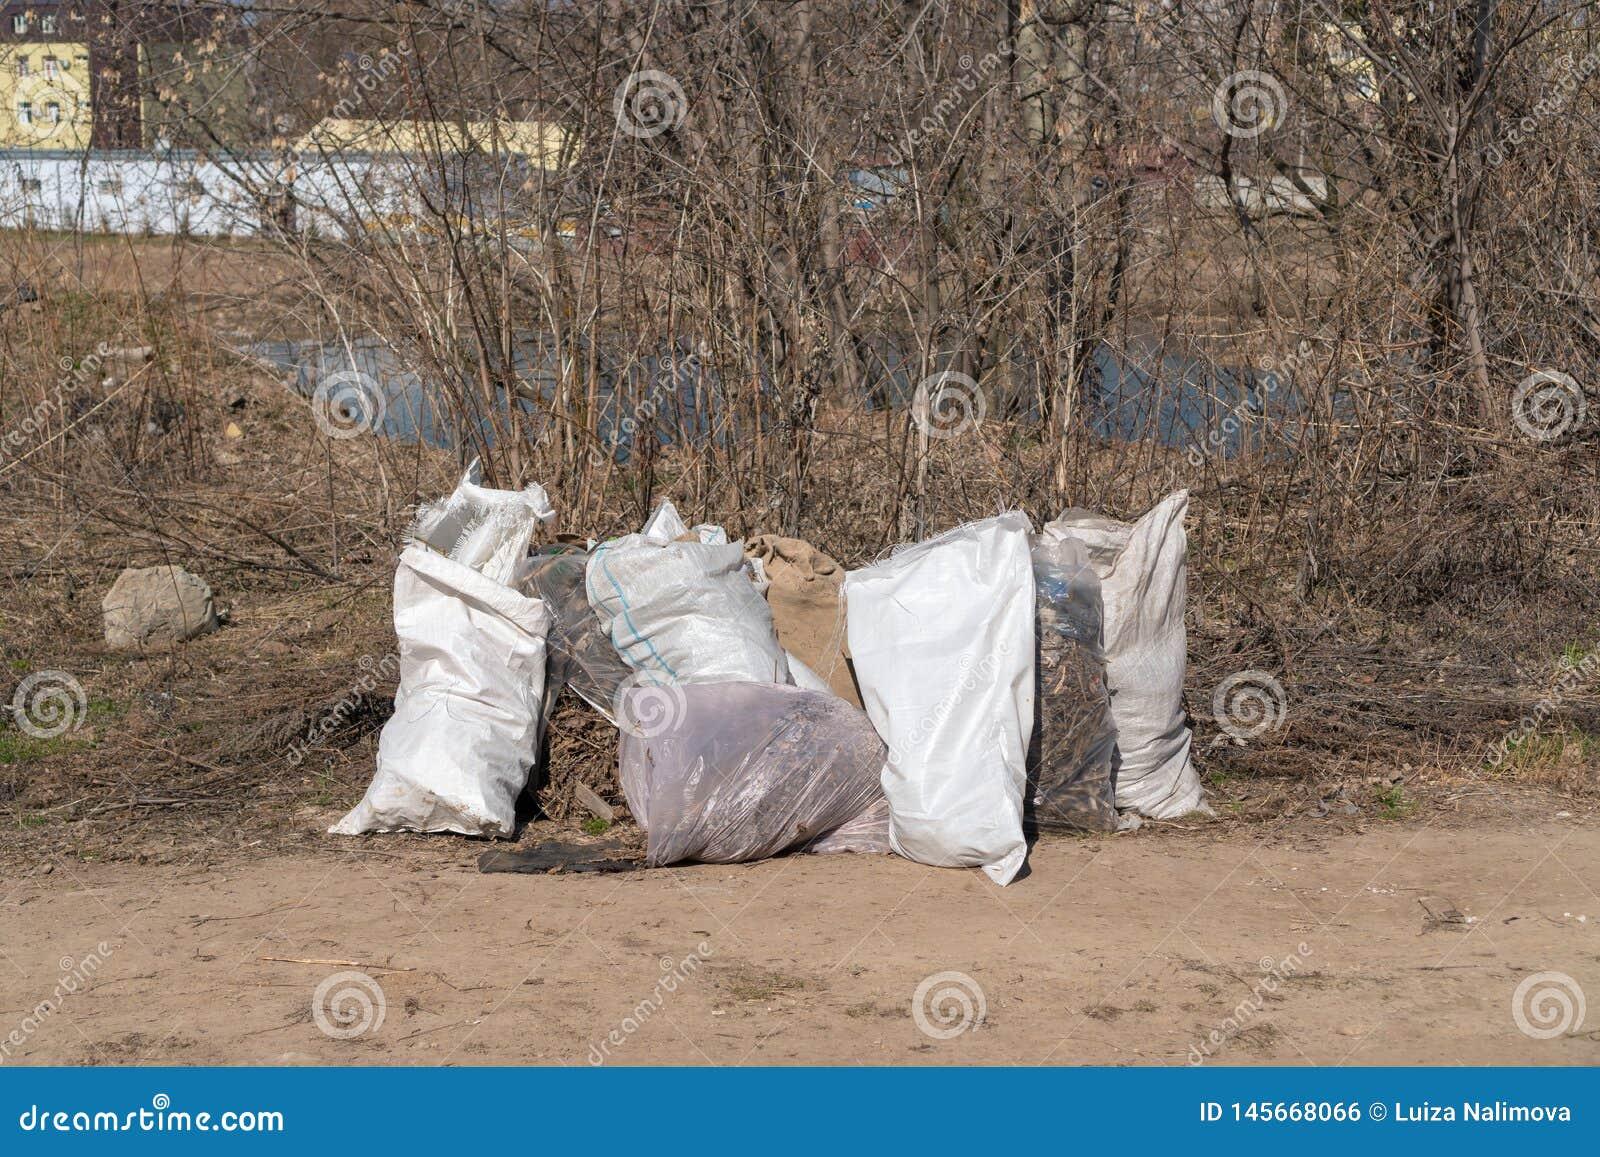 Russia, Kazan - April 20, 2019: Garbage bags on the river bank.